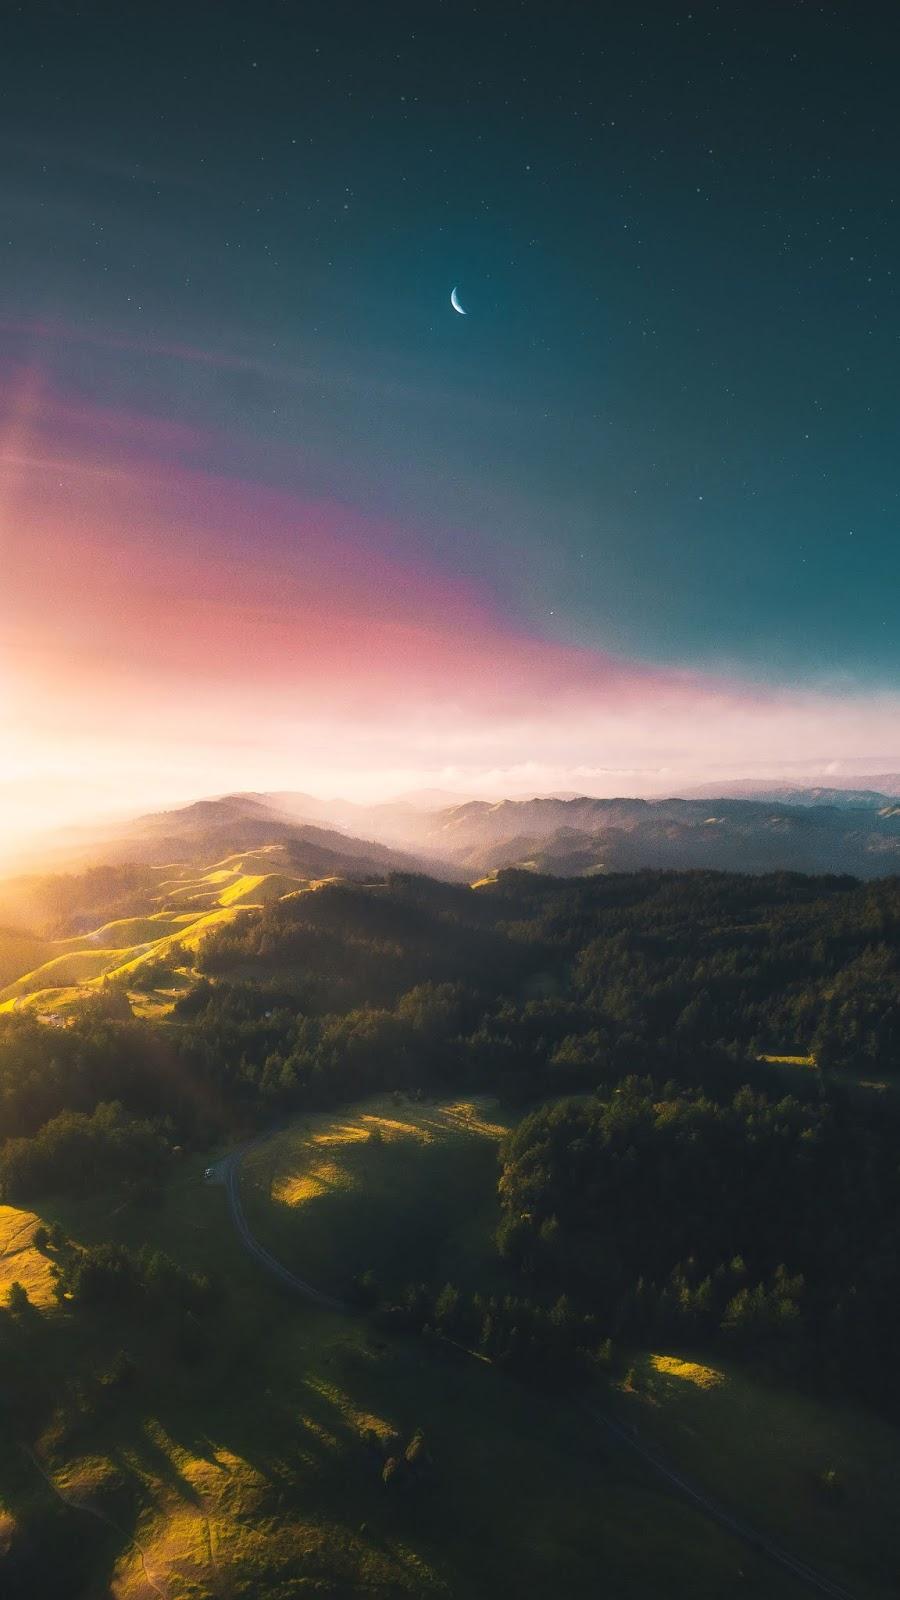 Dreamy hills